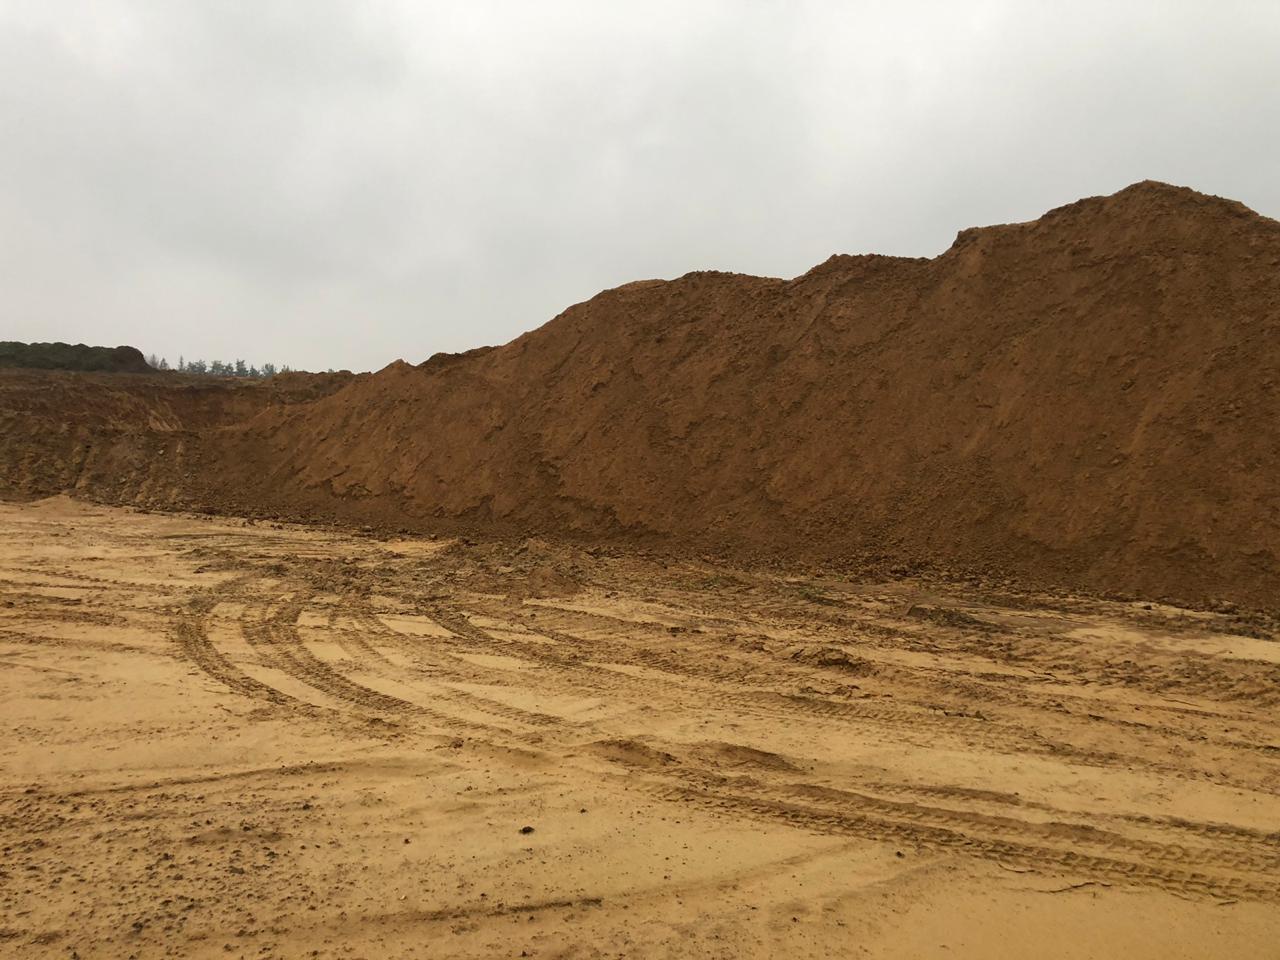 песчаный карьер